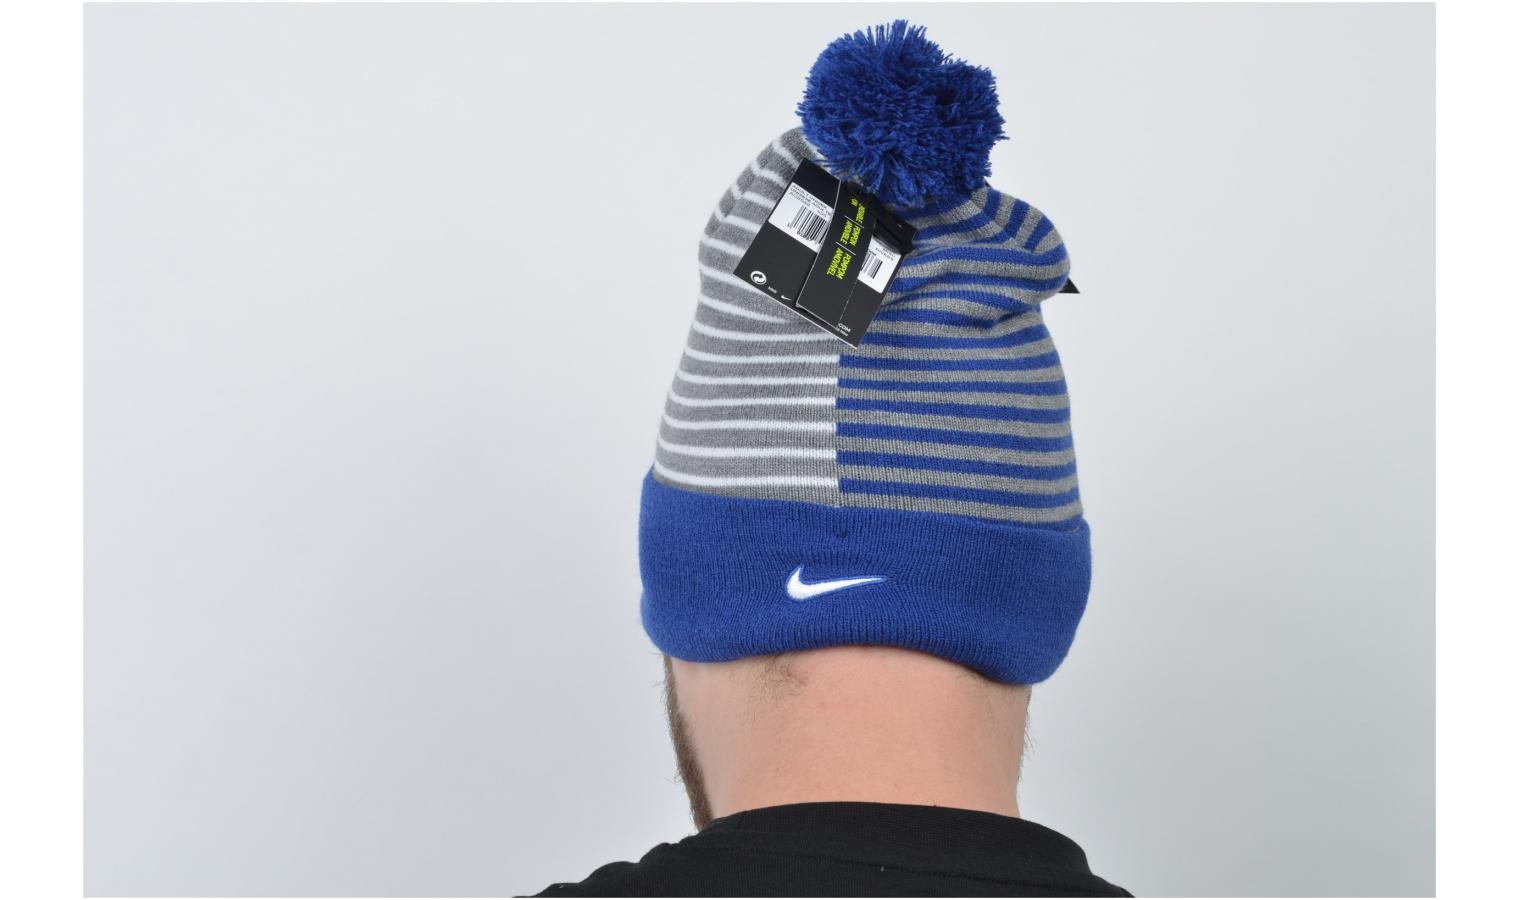 f737dff4802 Čepice Nike CFC BEANIE STRIPE KNIT modrá